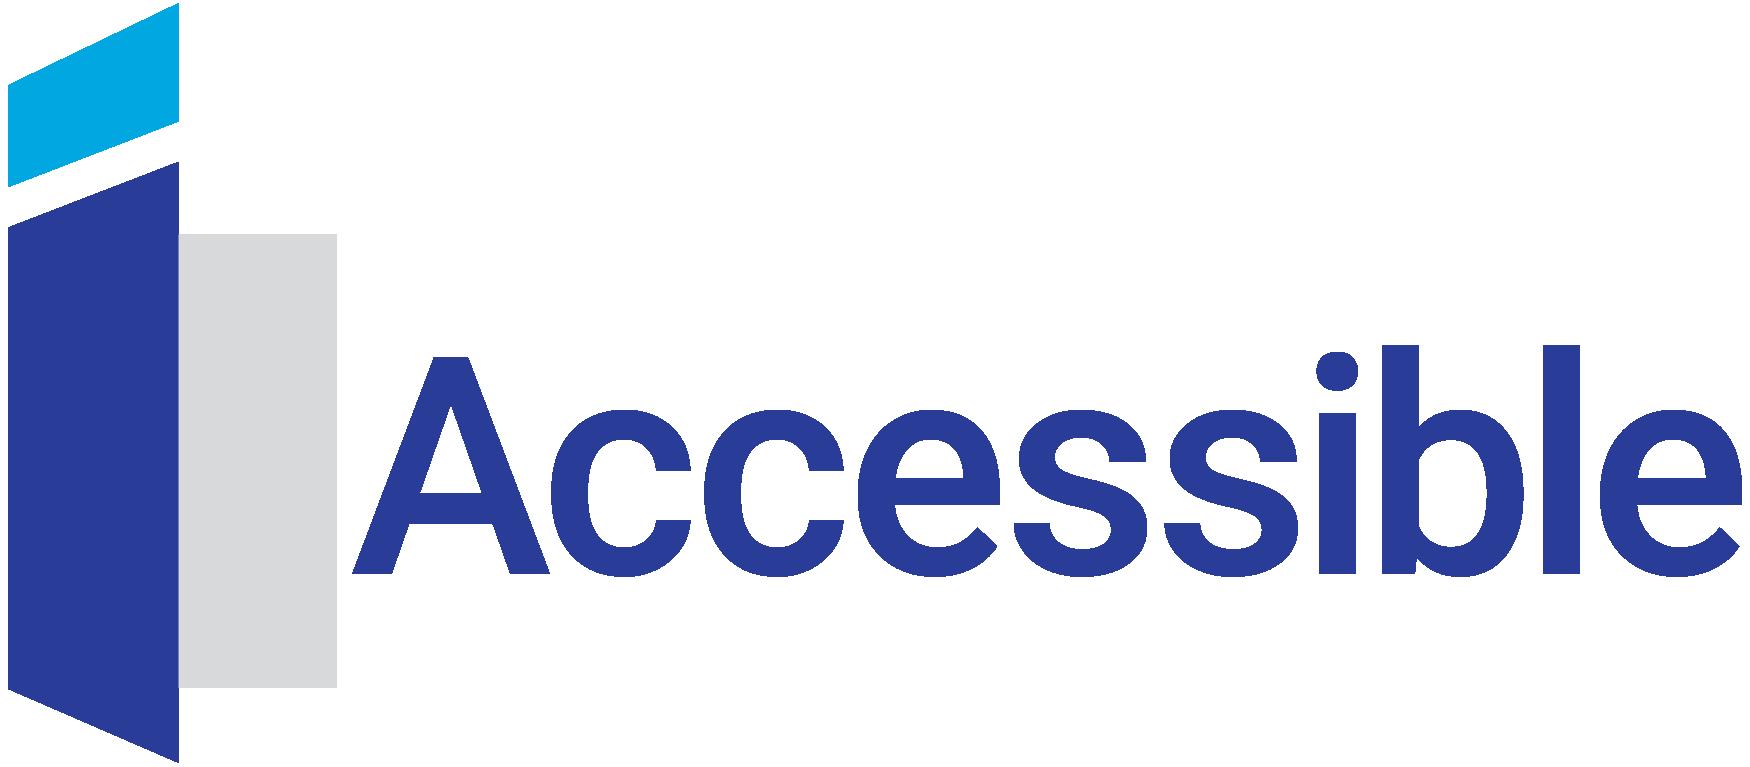 iaccessible logo